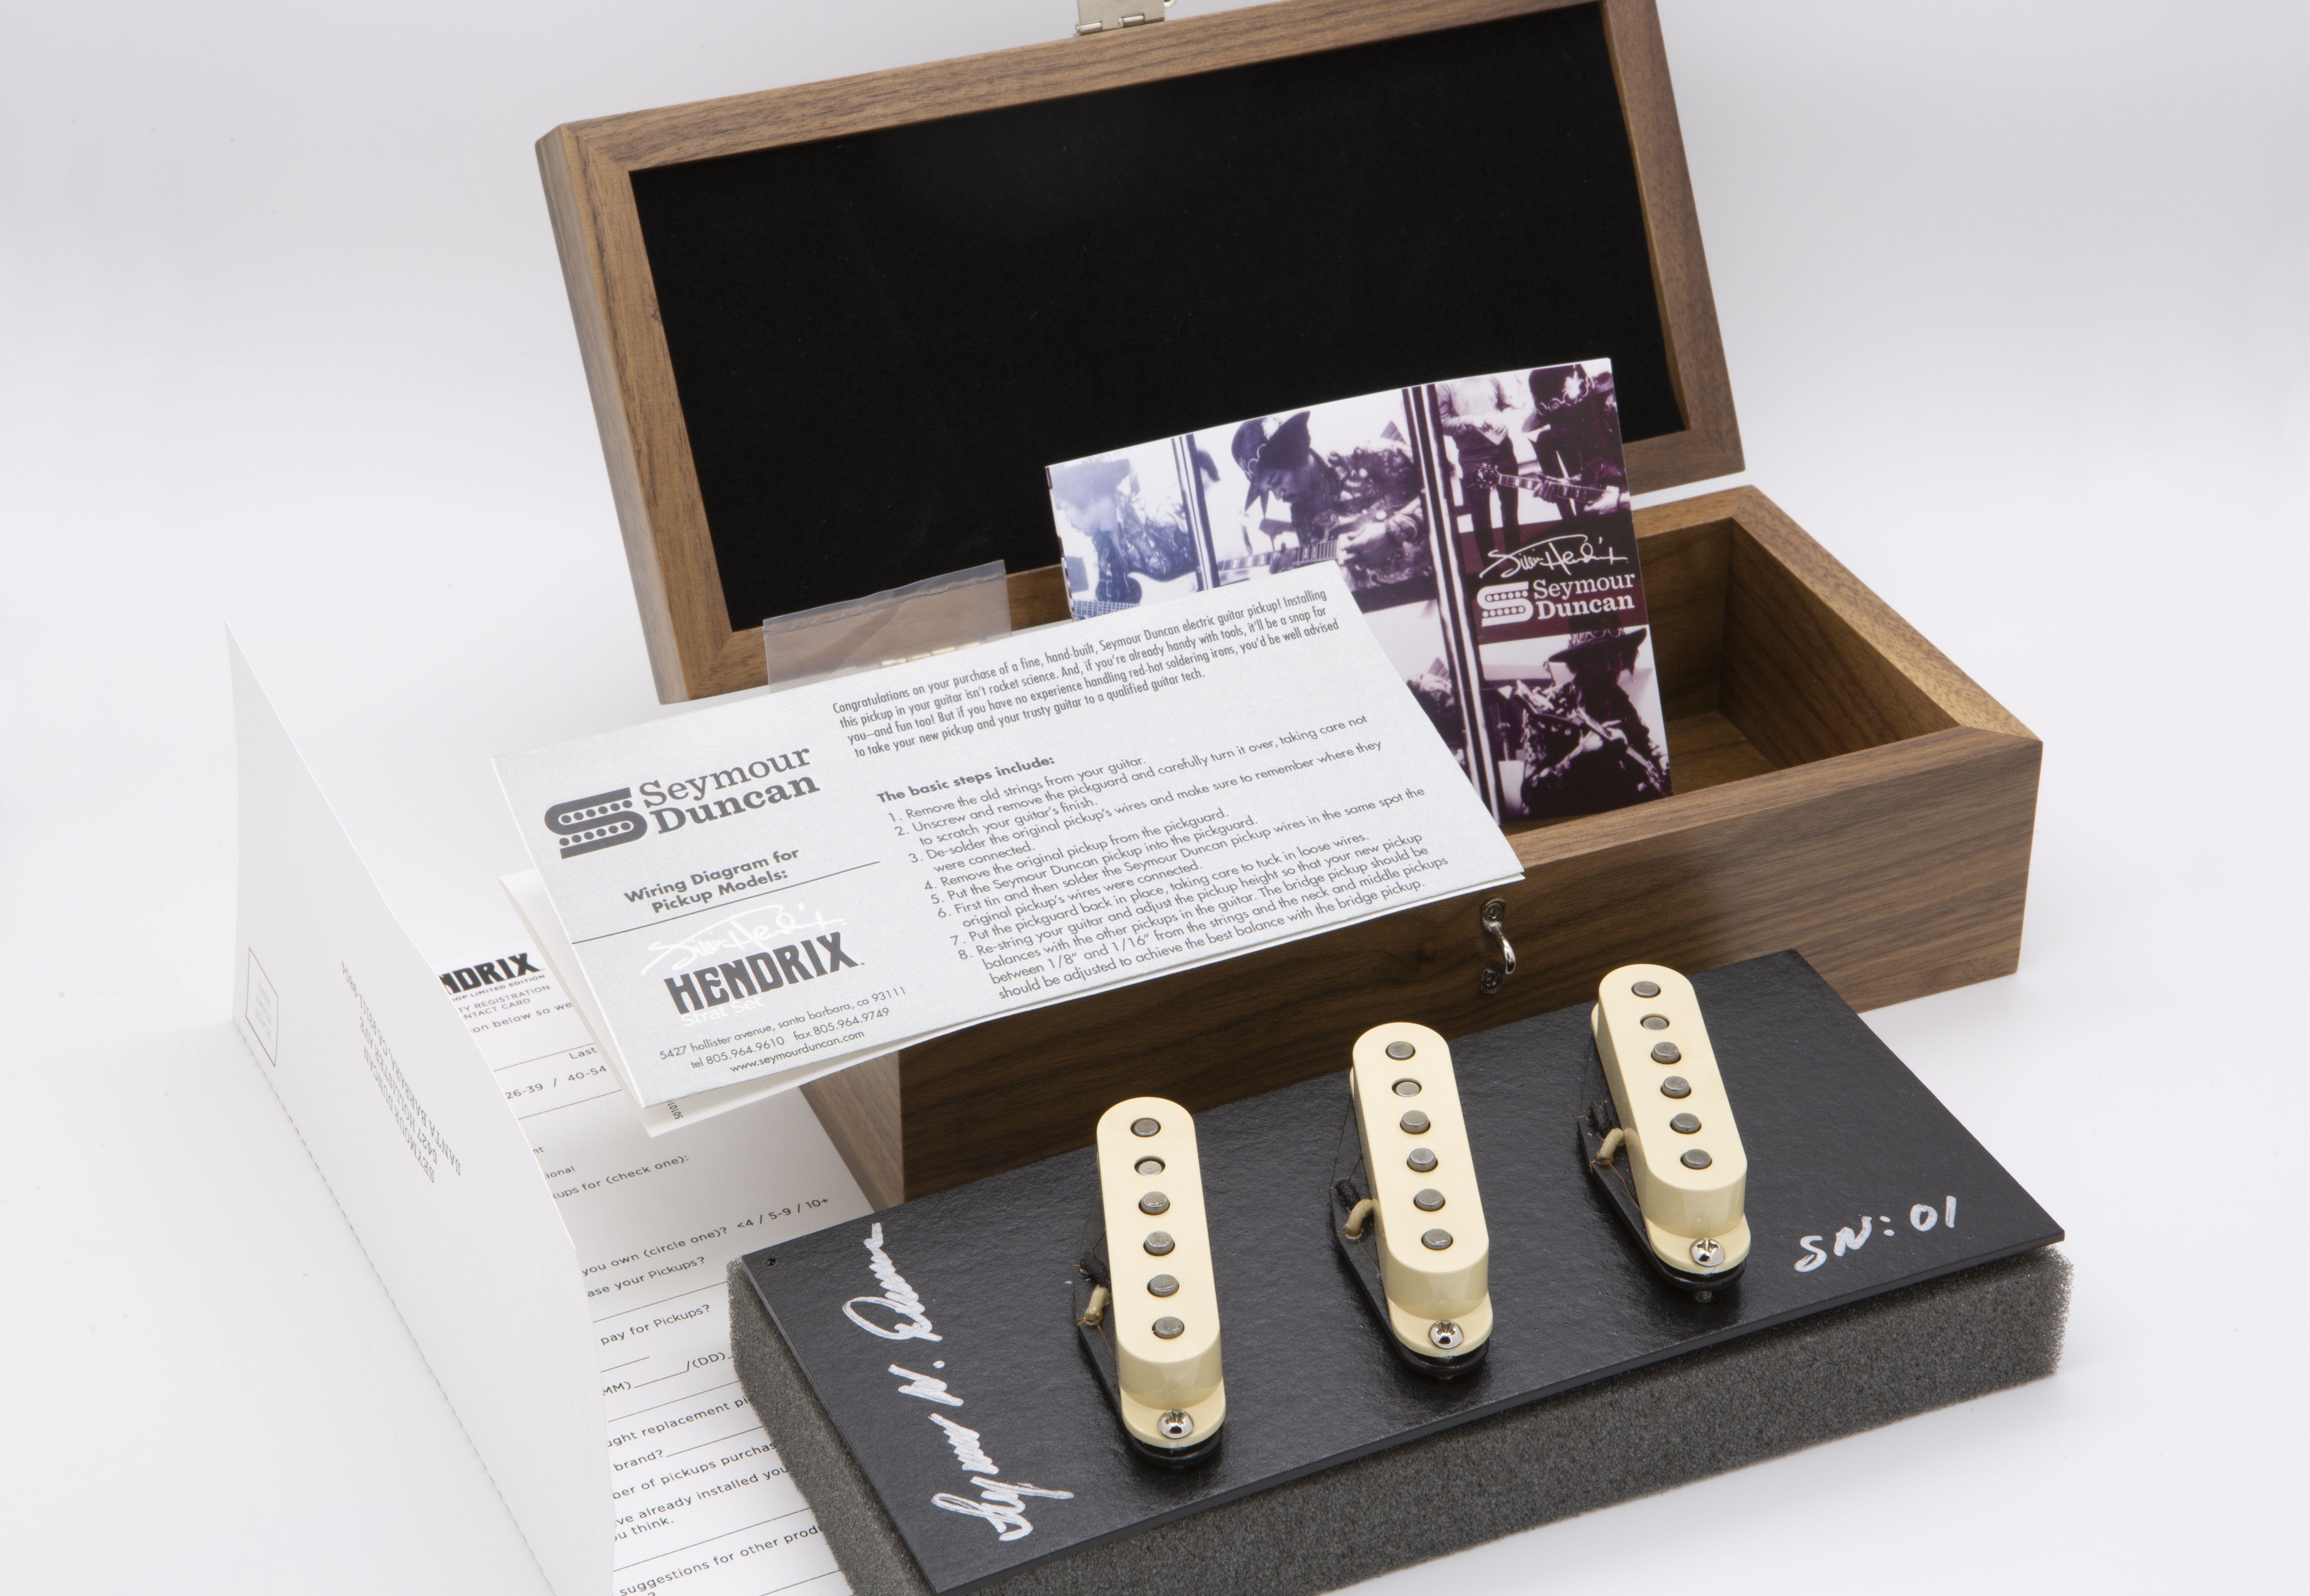 Seymour Duncan Hendrix Custom Shop Limited Edition Box Set